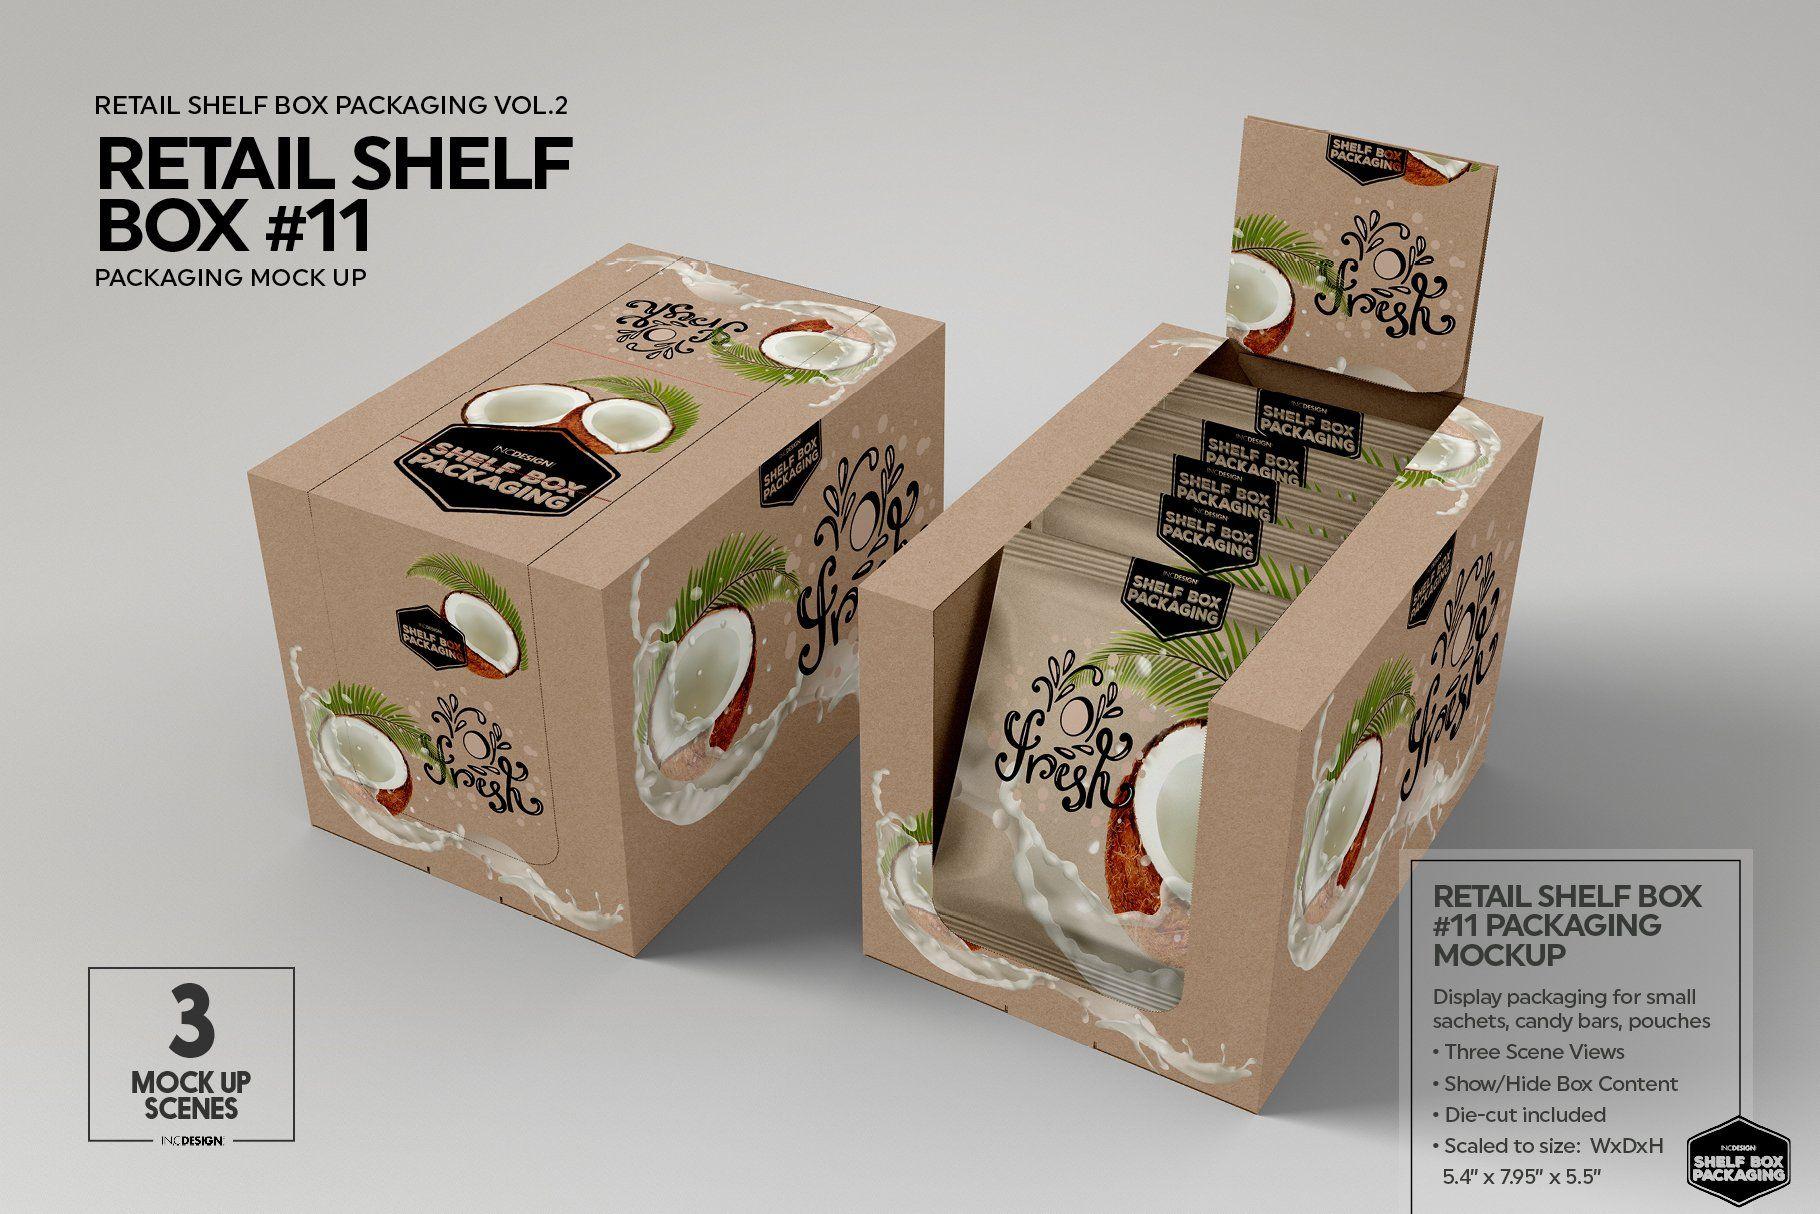 Download Retail Shelf Box 11 Packaging Mockup Packaging Mockup Retail Shelving Packaging